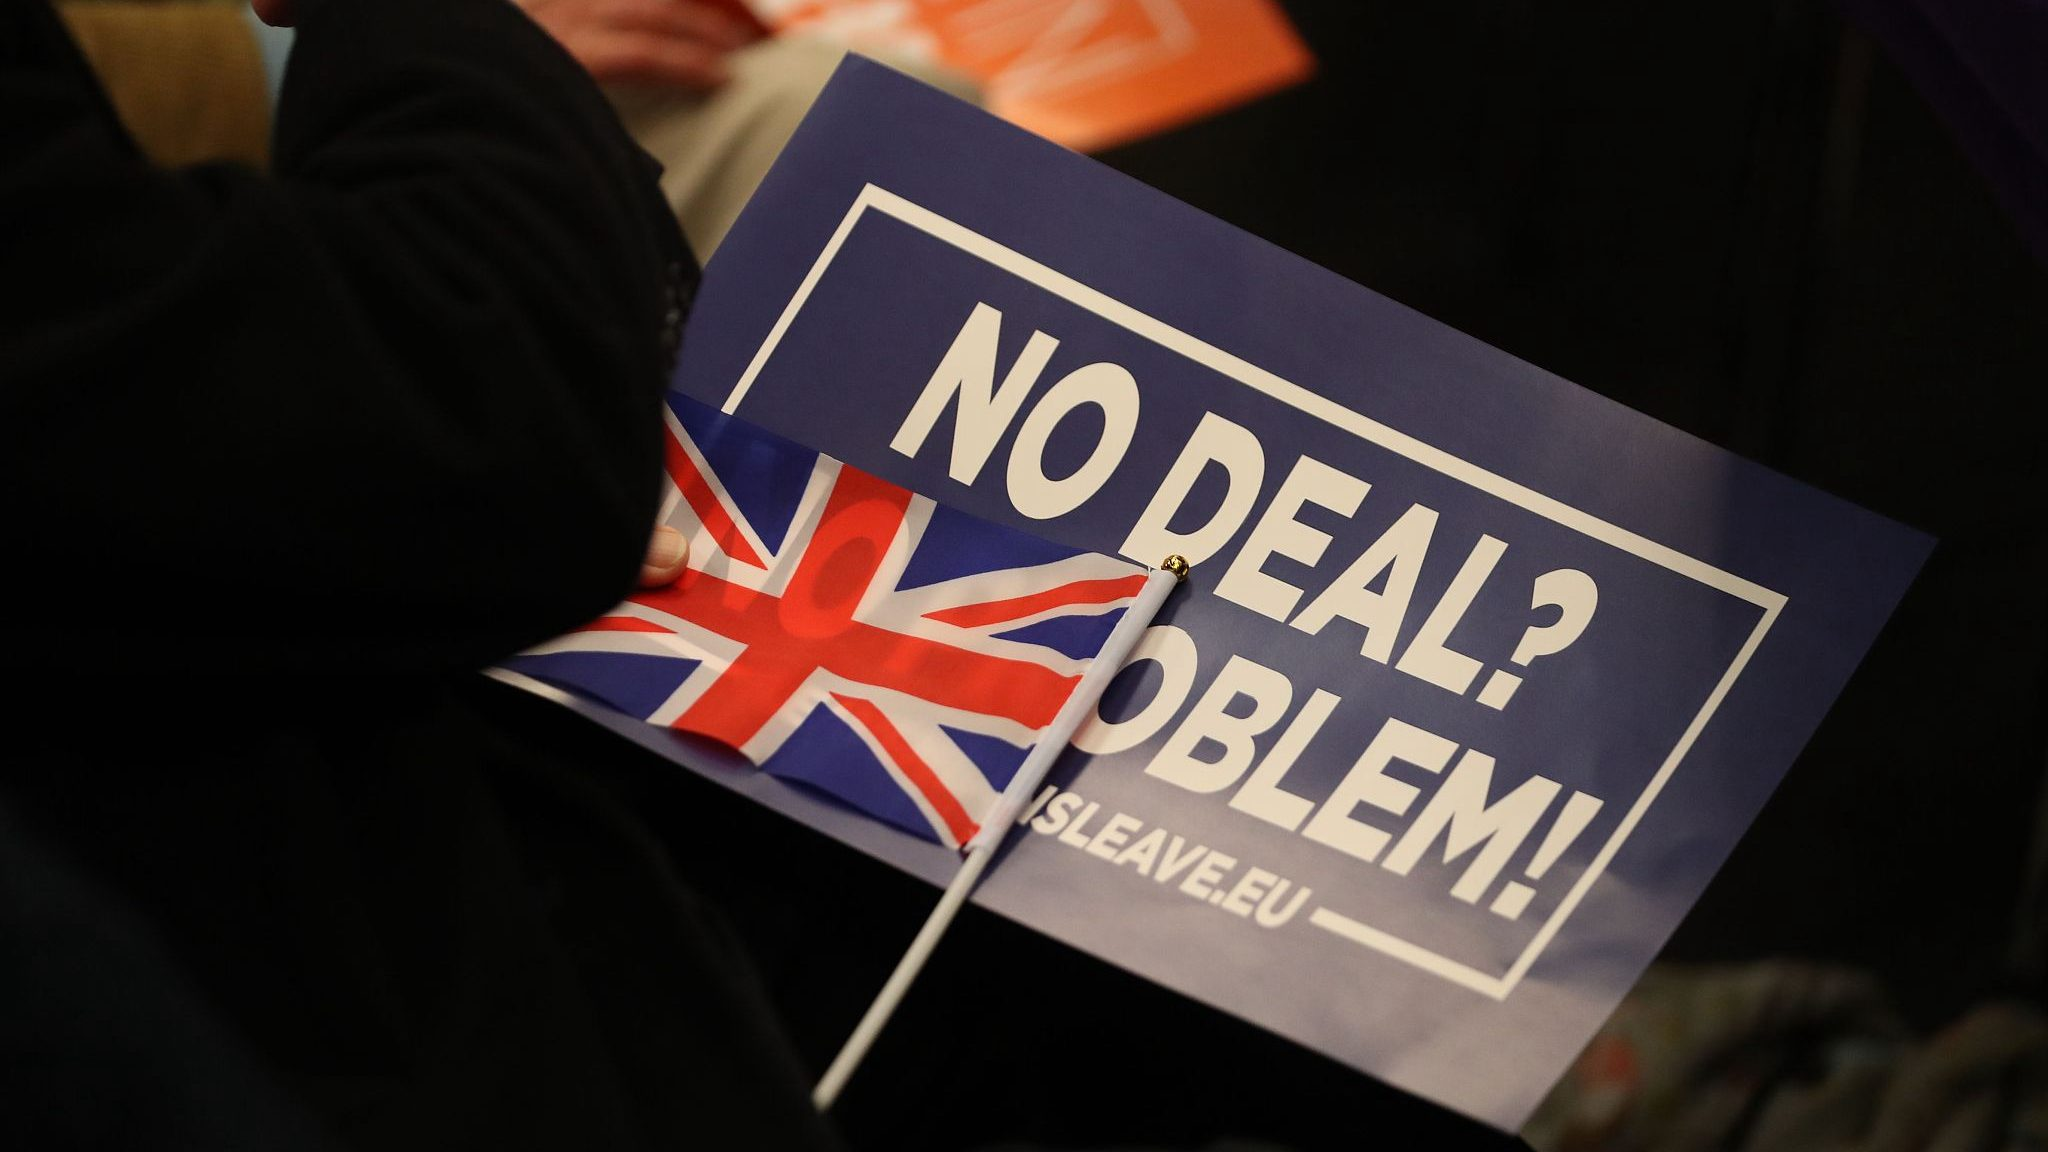 no-deal Brexit2 CGTN.jpg